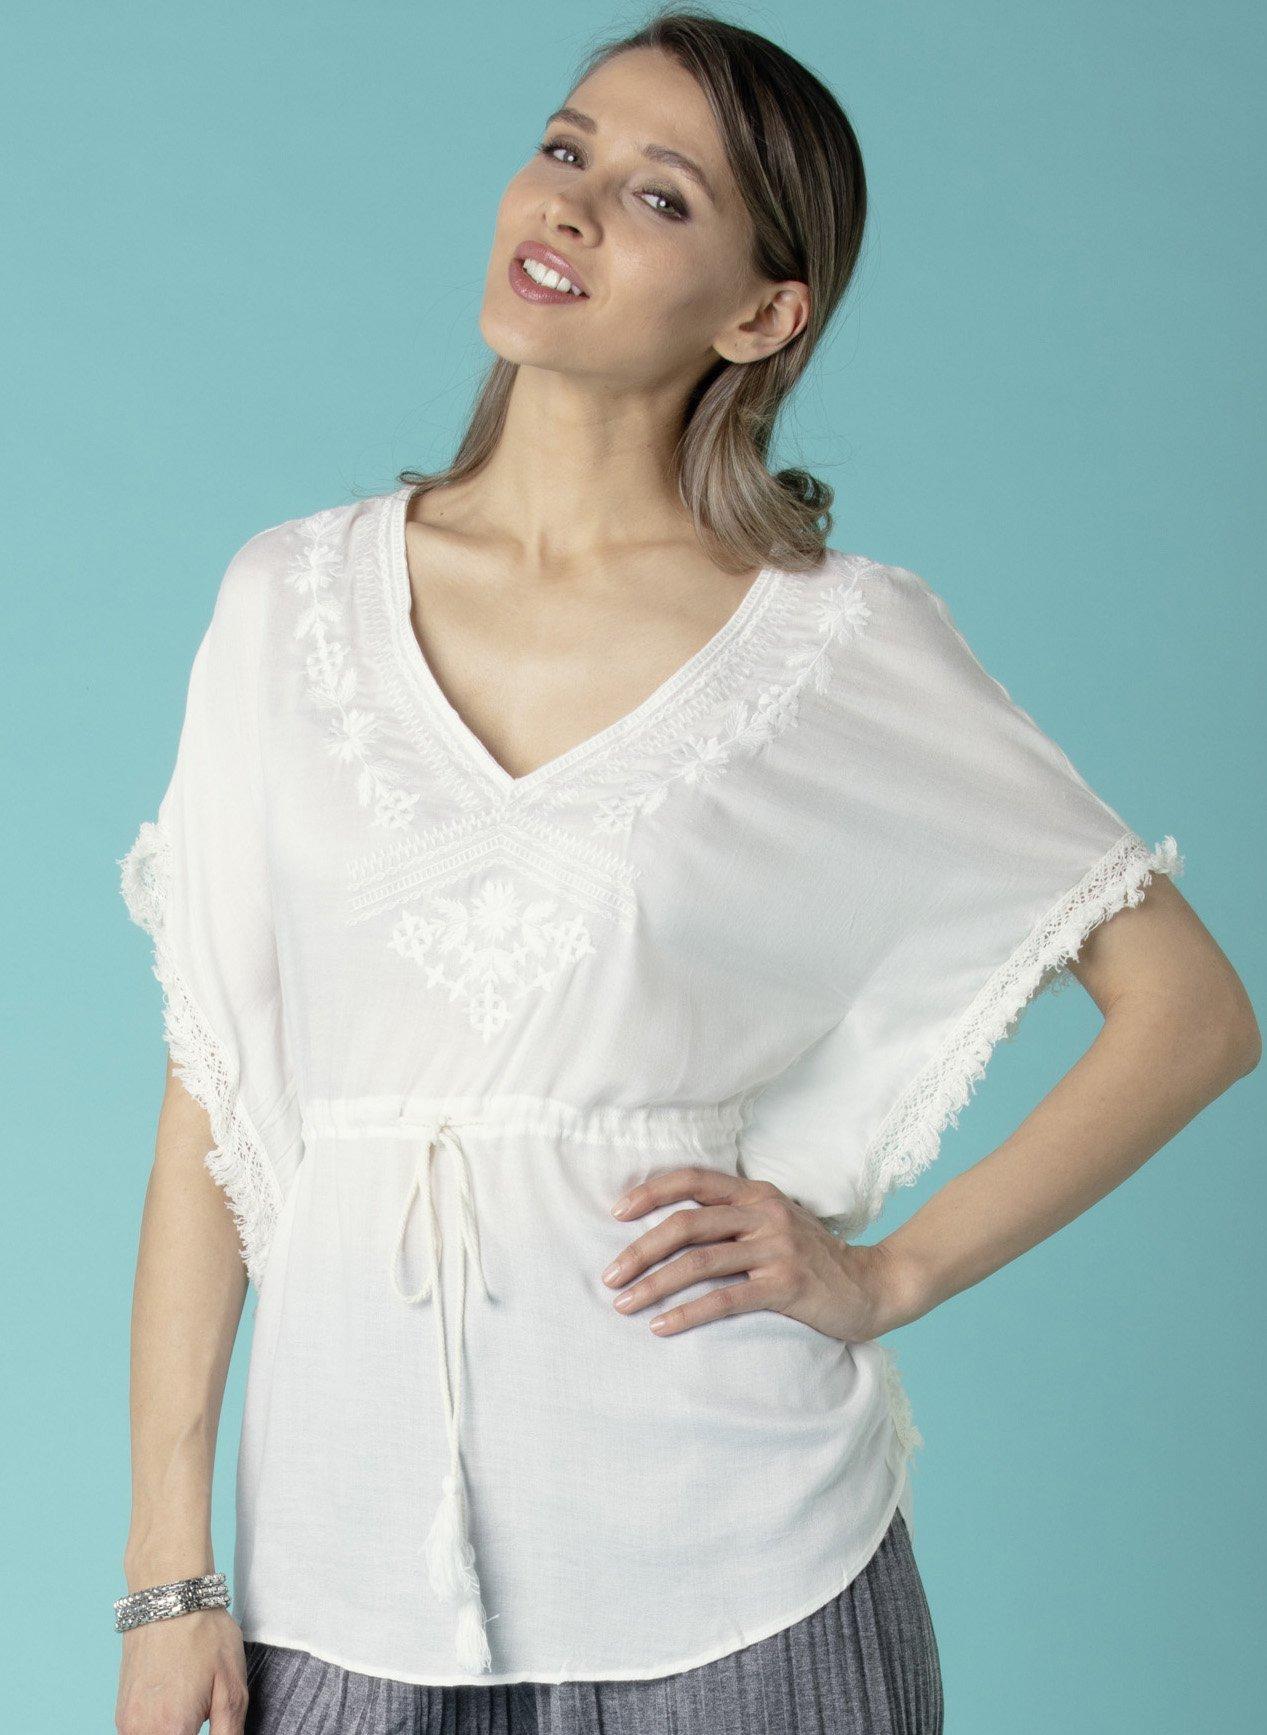 Poncho-Bluse, Fransen